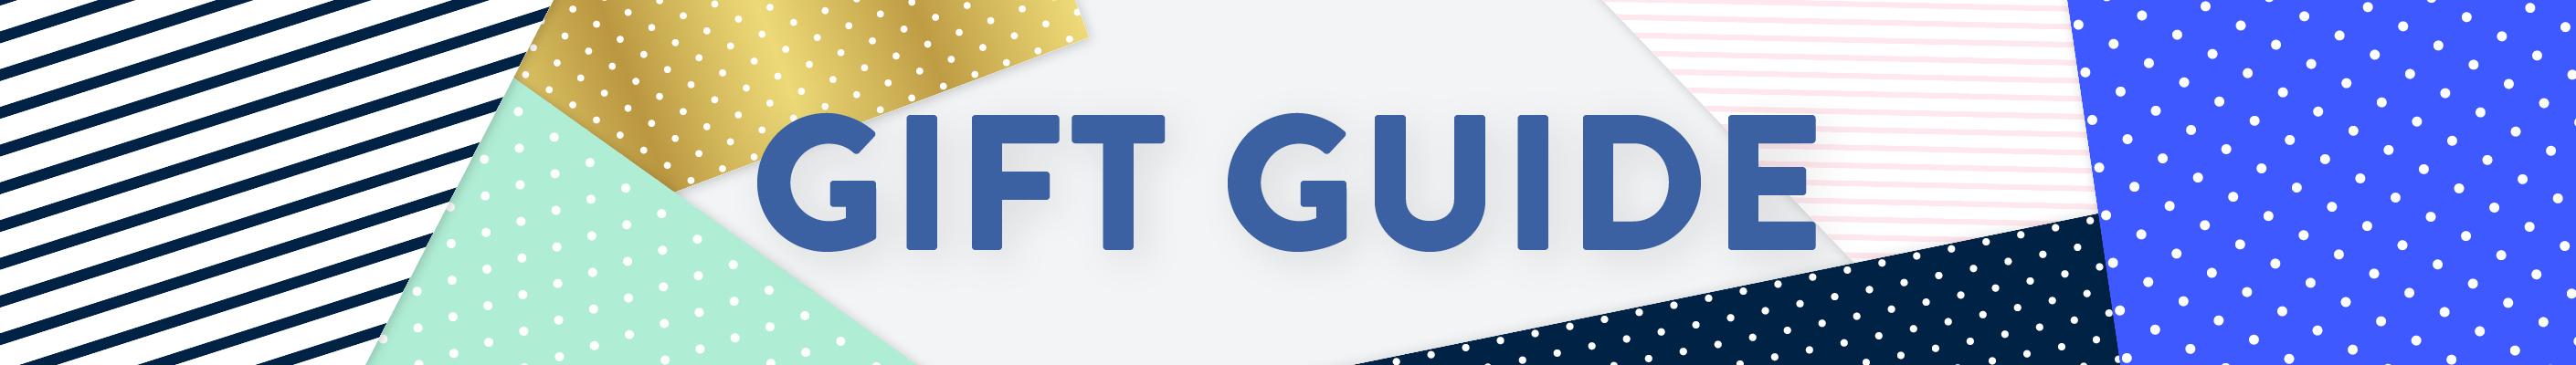 gc-2020-merch-gift-guide-home-page-tiles-v1-1.jpg